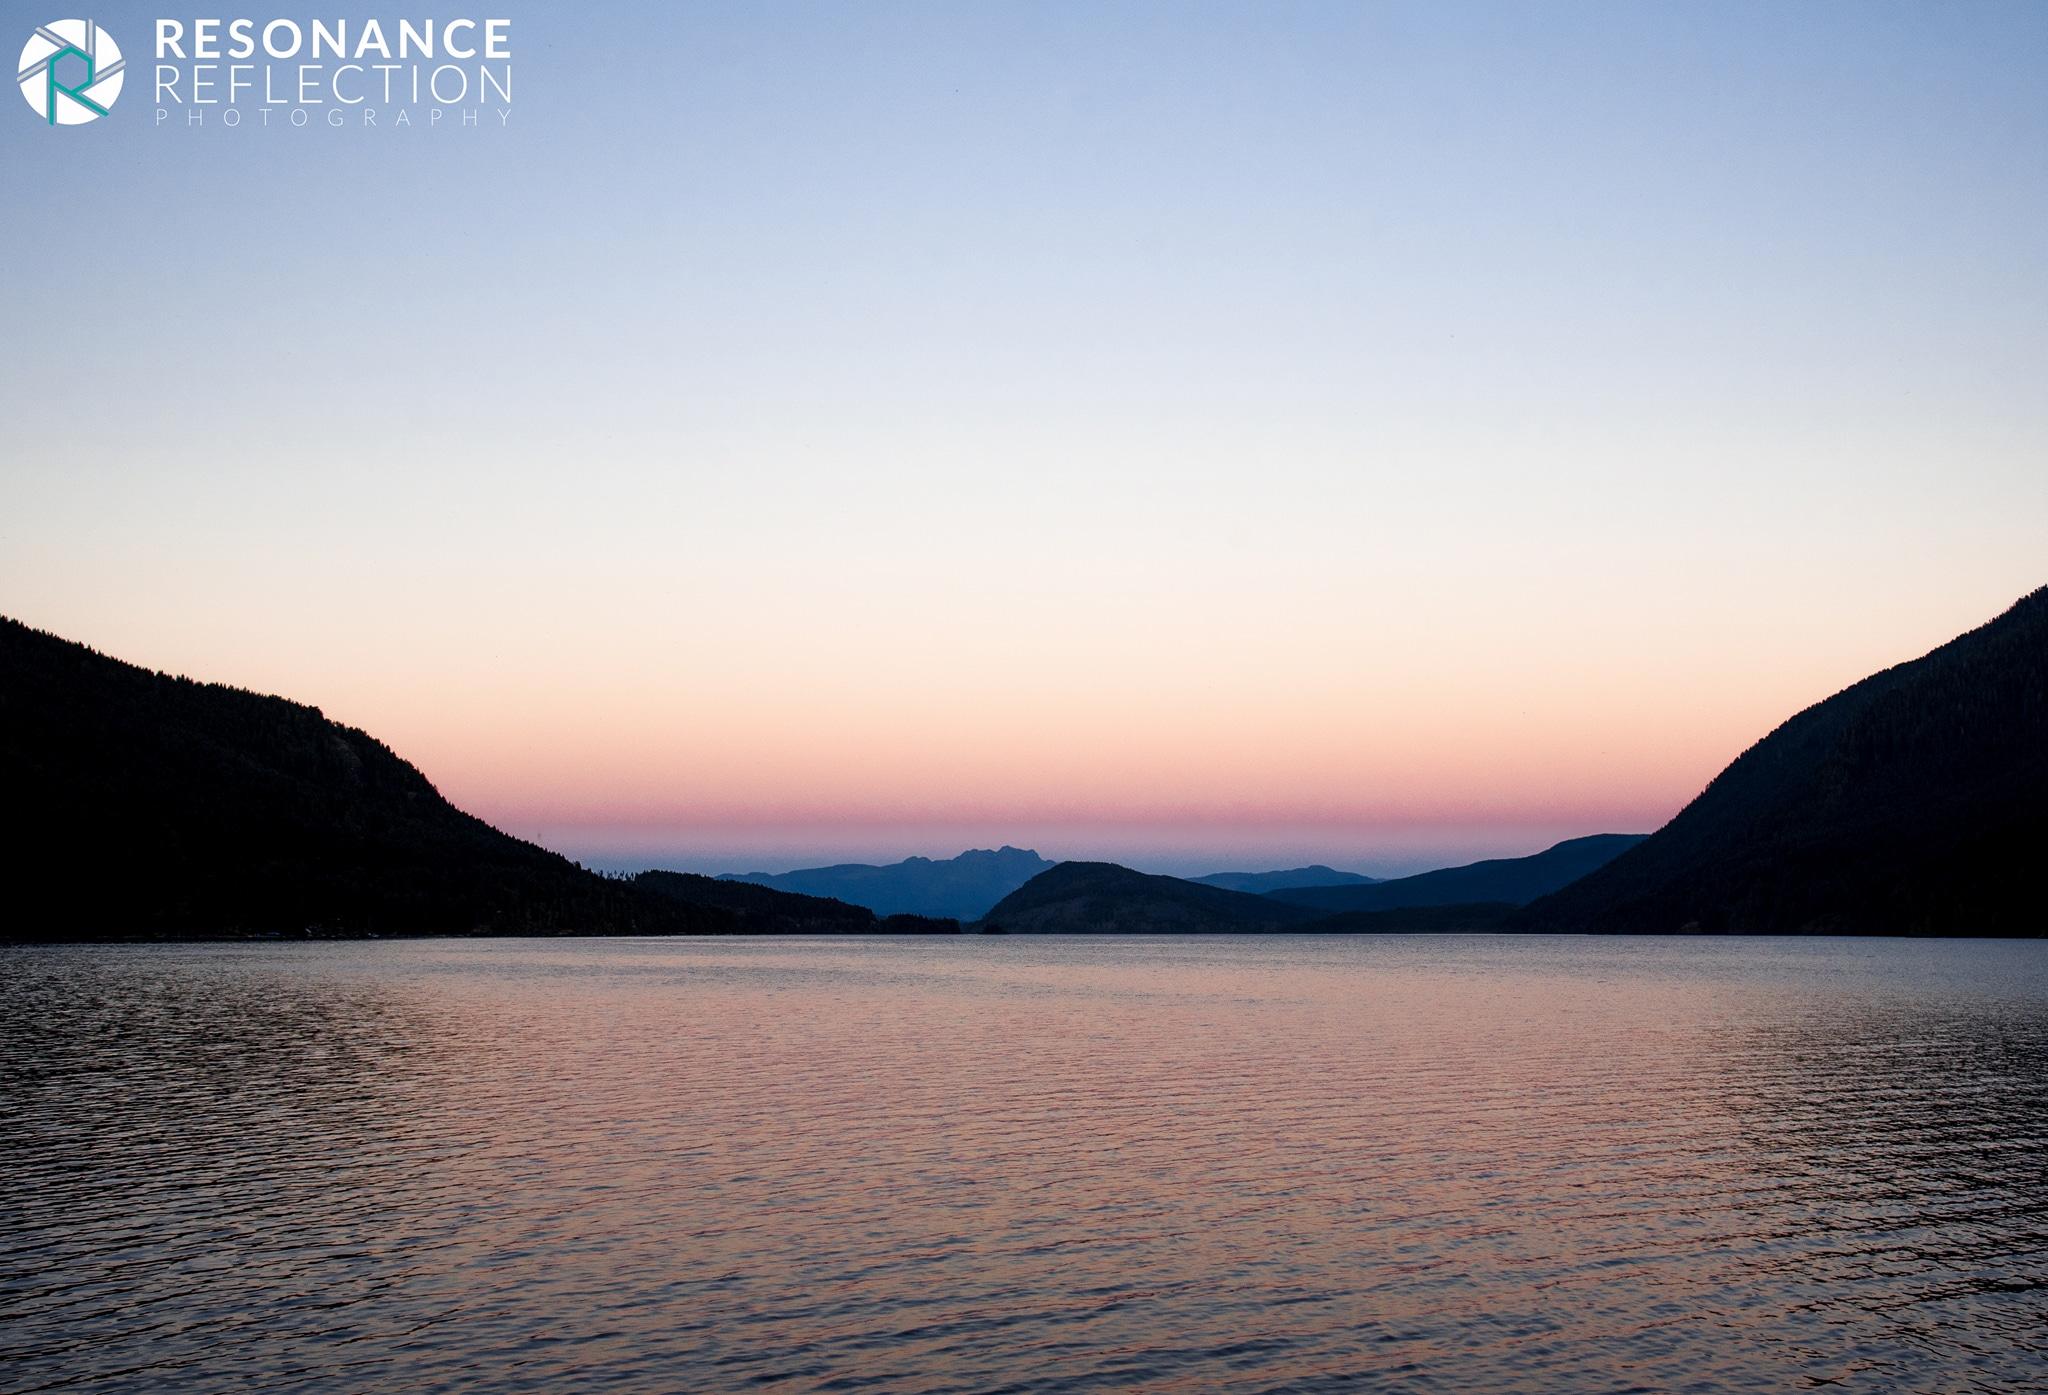 Location: Sproat Lake. Vancouver Island, British Columbia, Canada